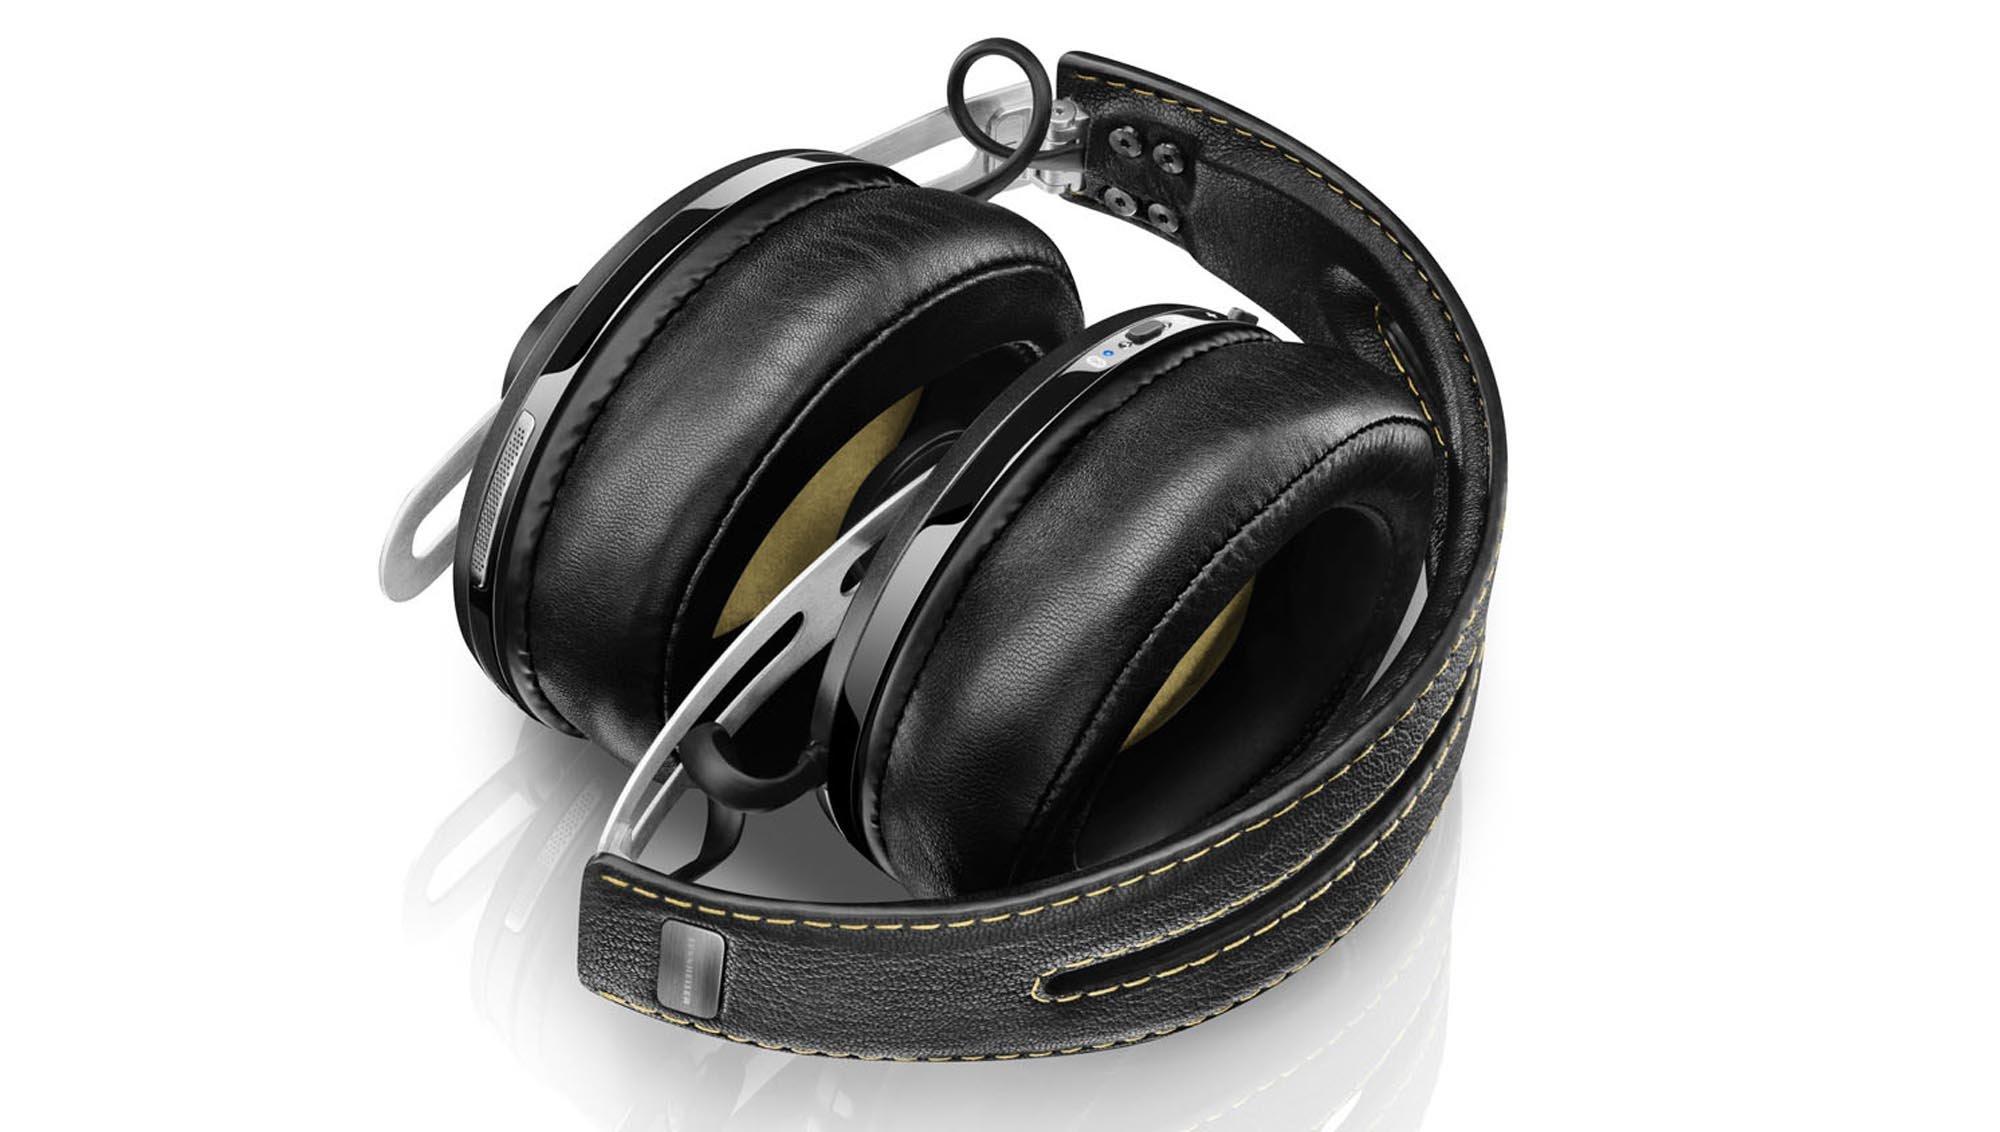 Sennheiser momentum 2.0 on-ear wireless headphones review